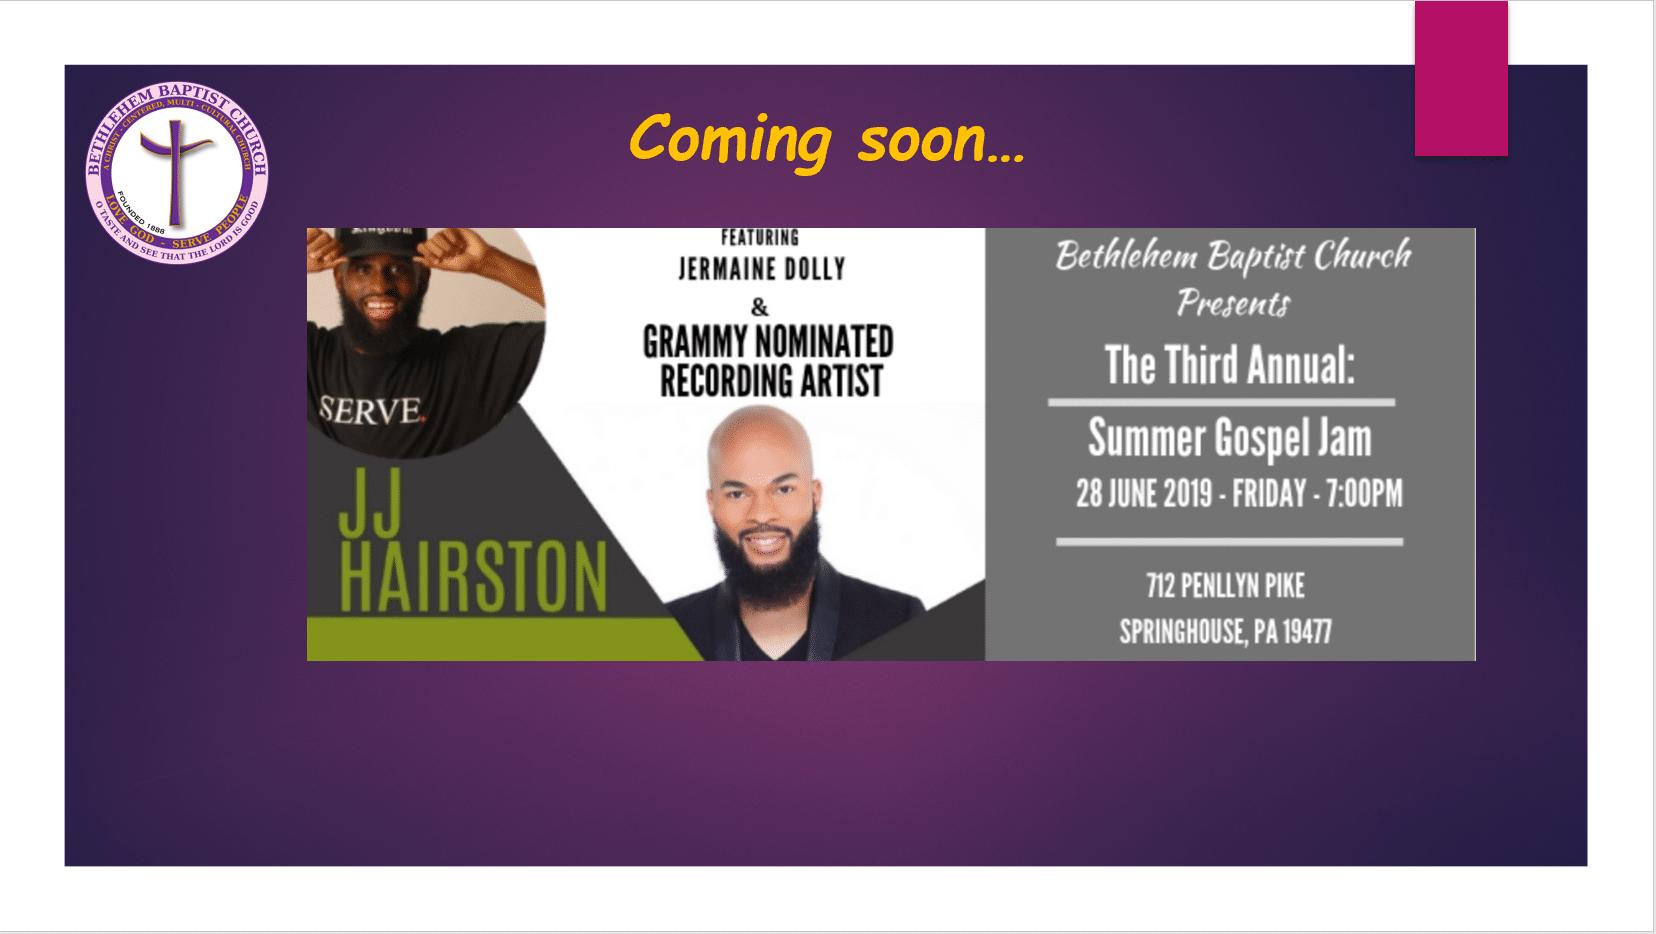 Summer Gospel Jam 2019